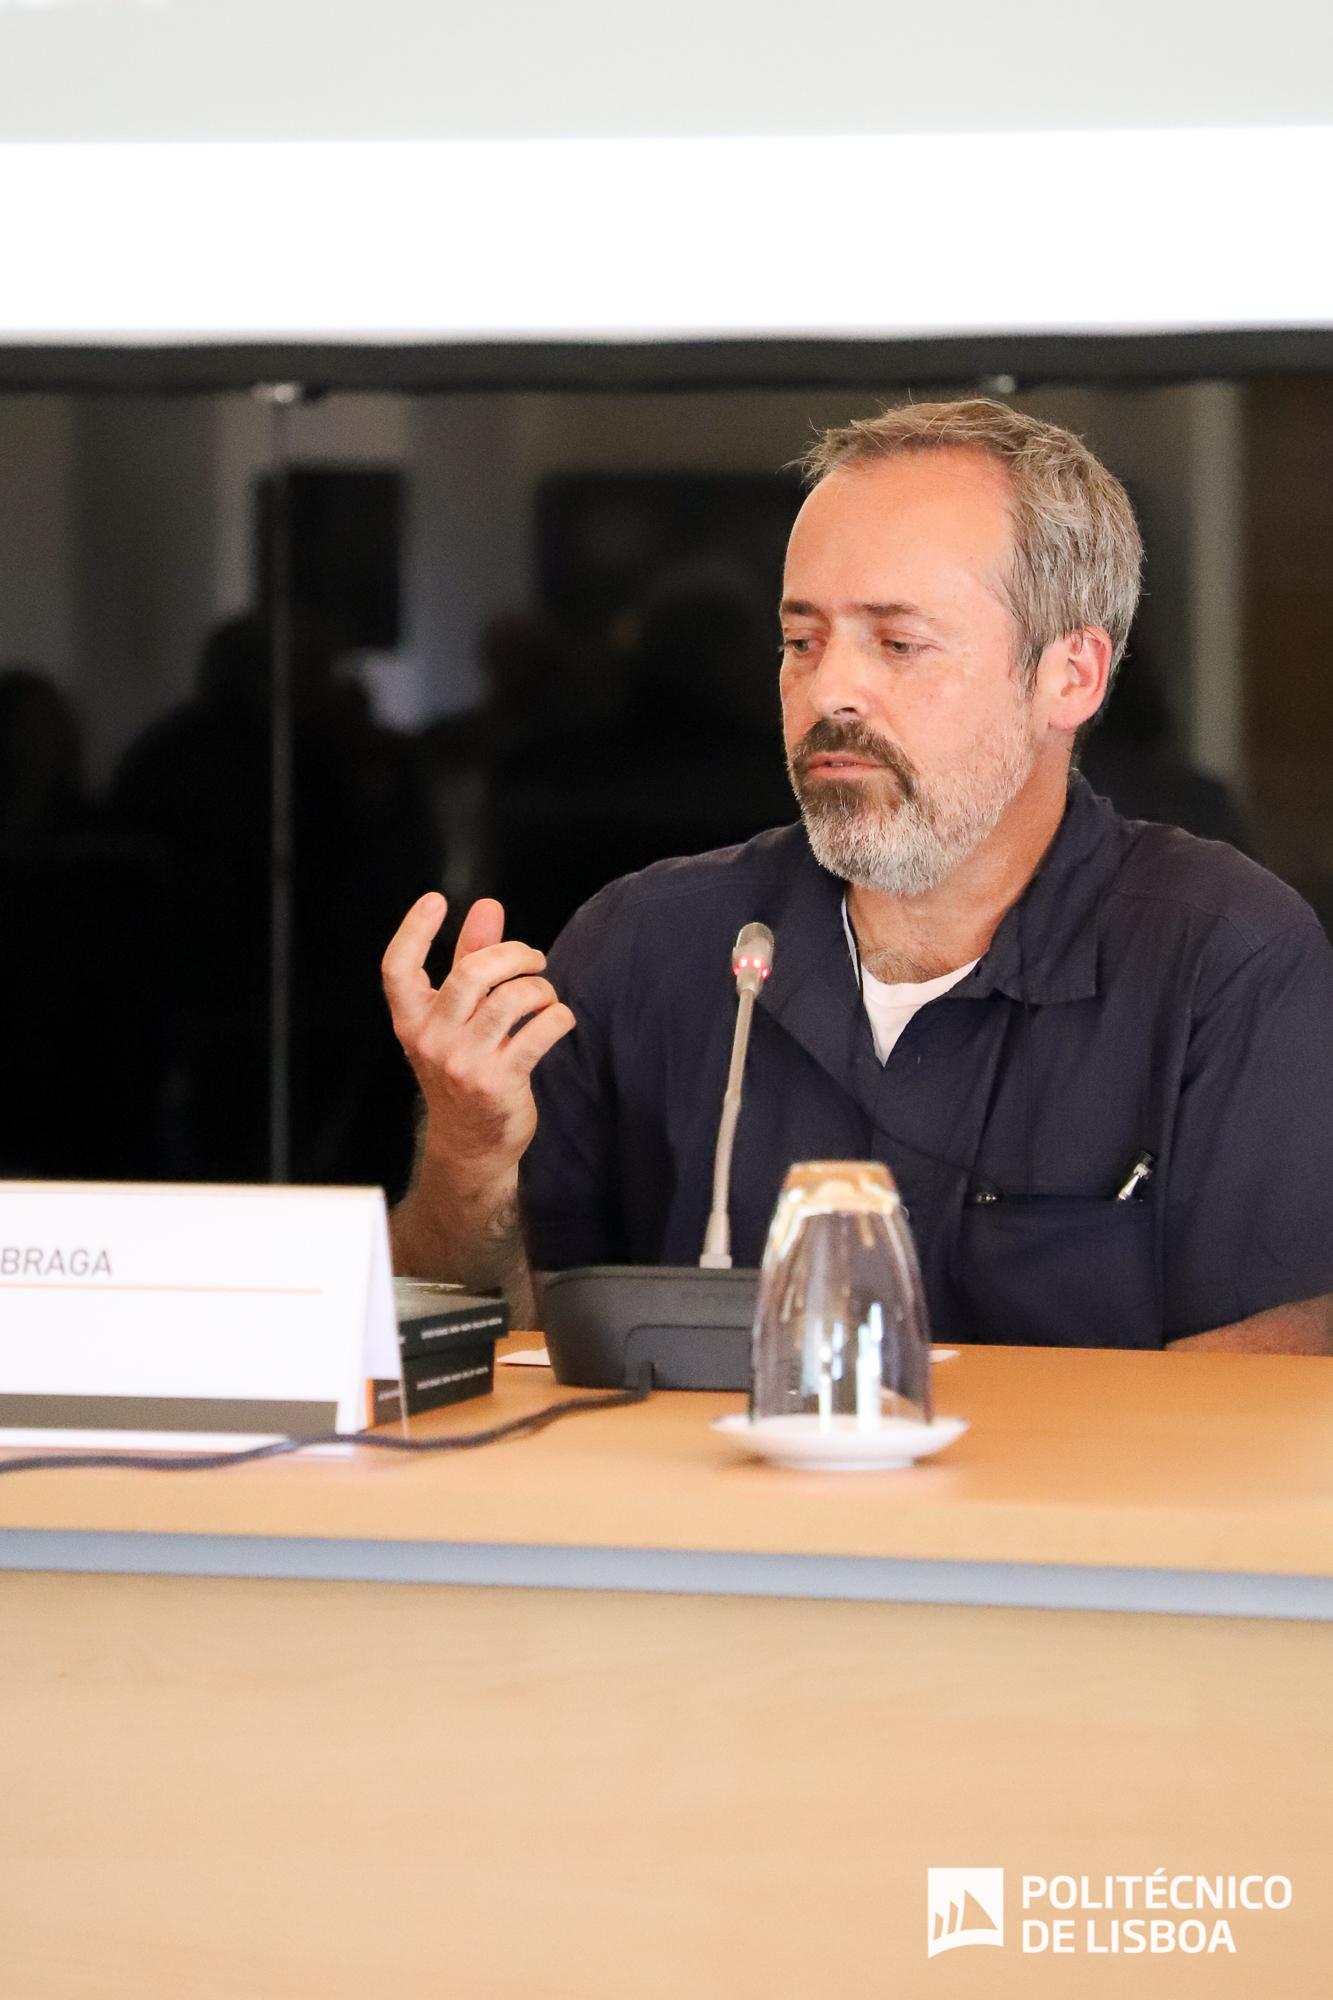 Alexandre Braga